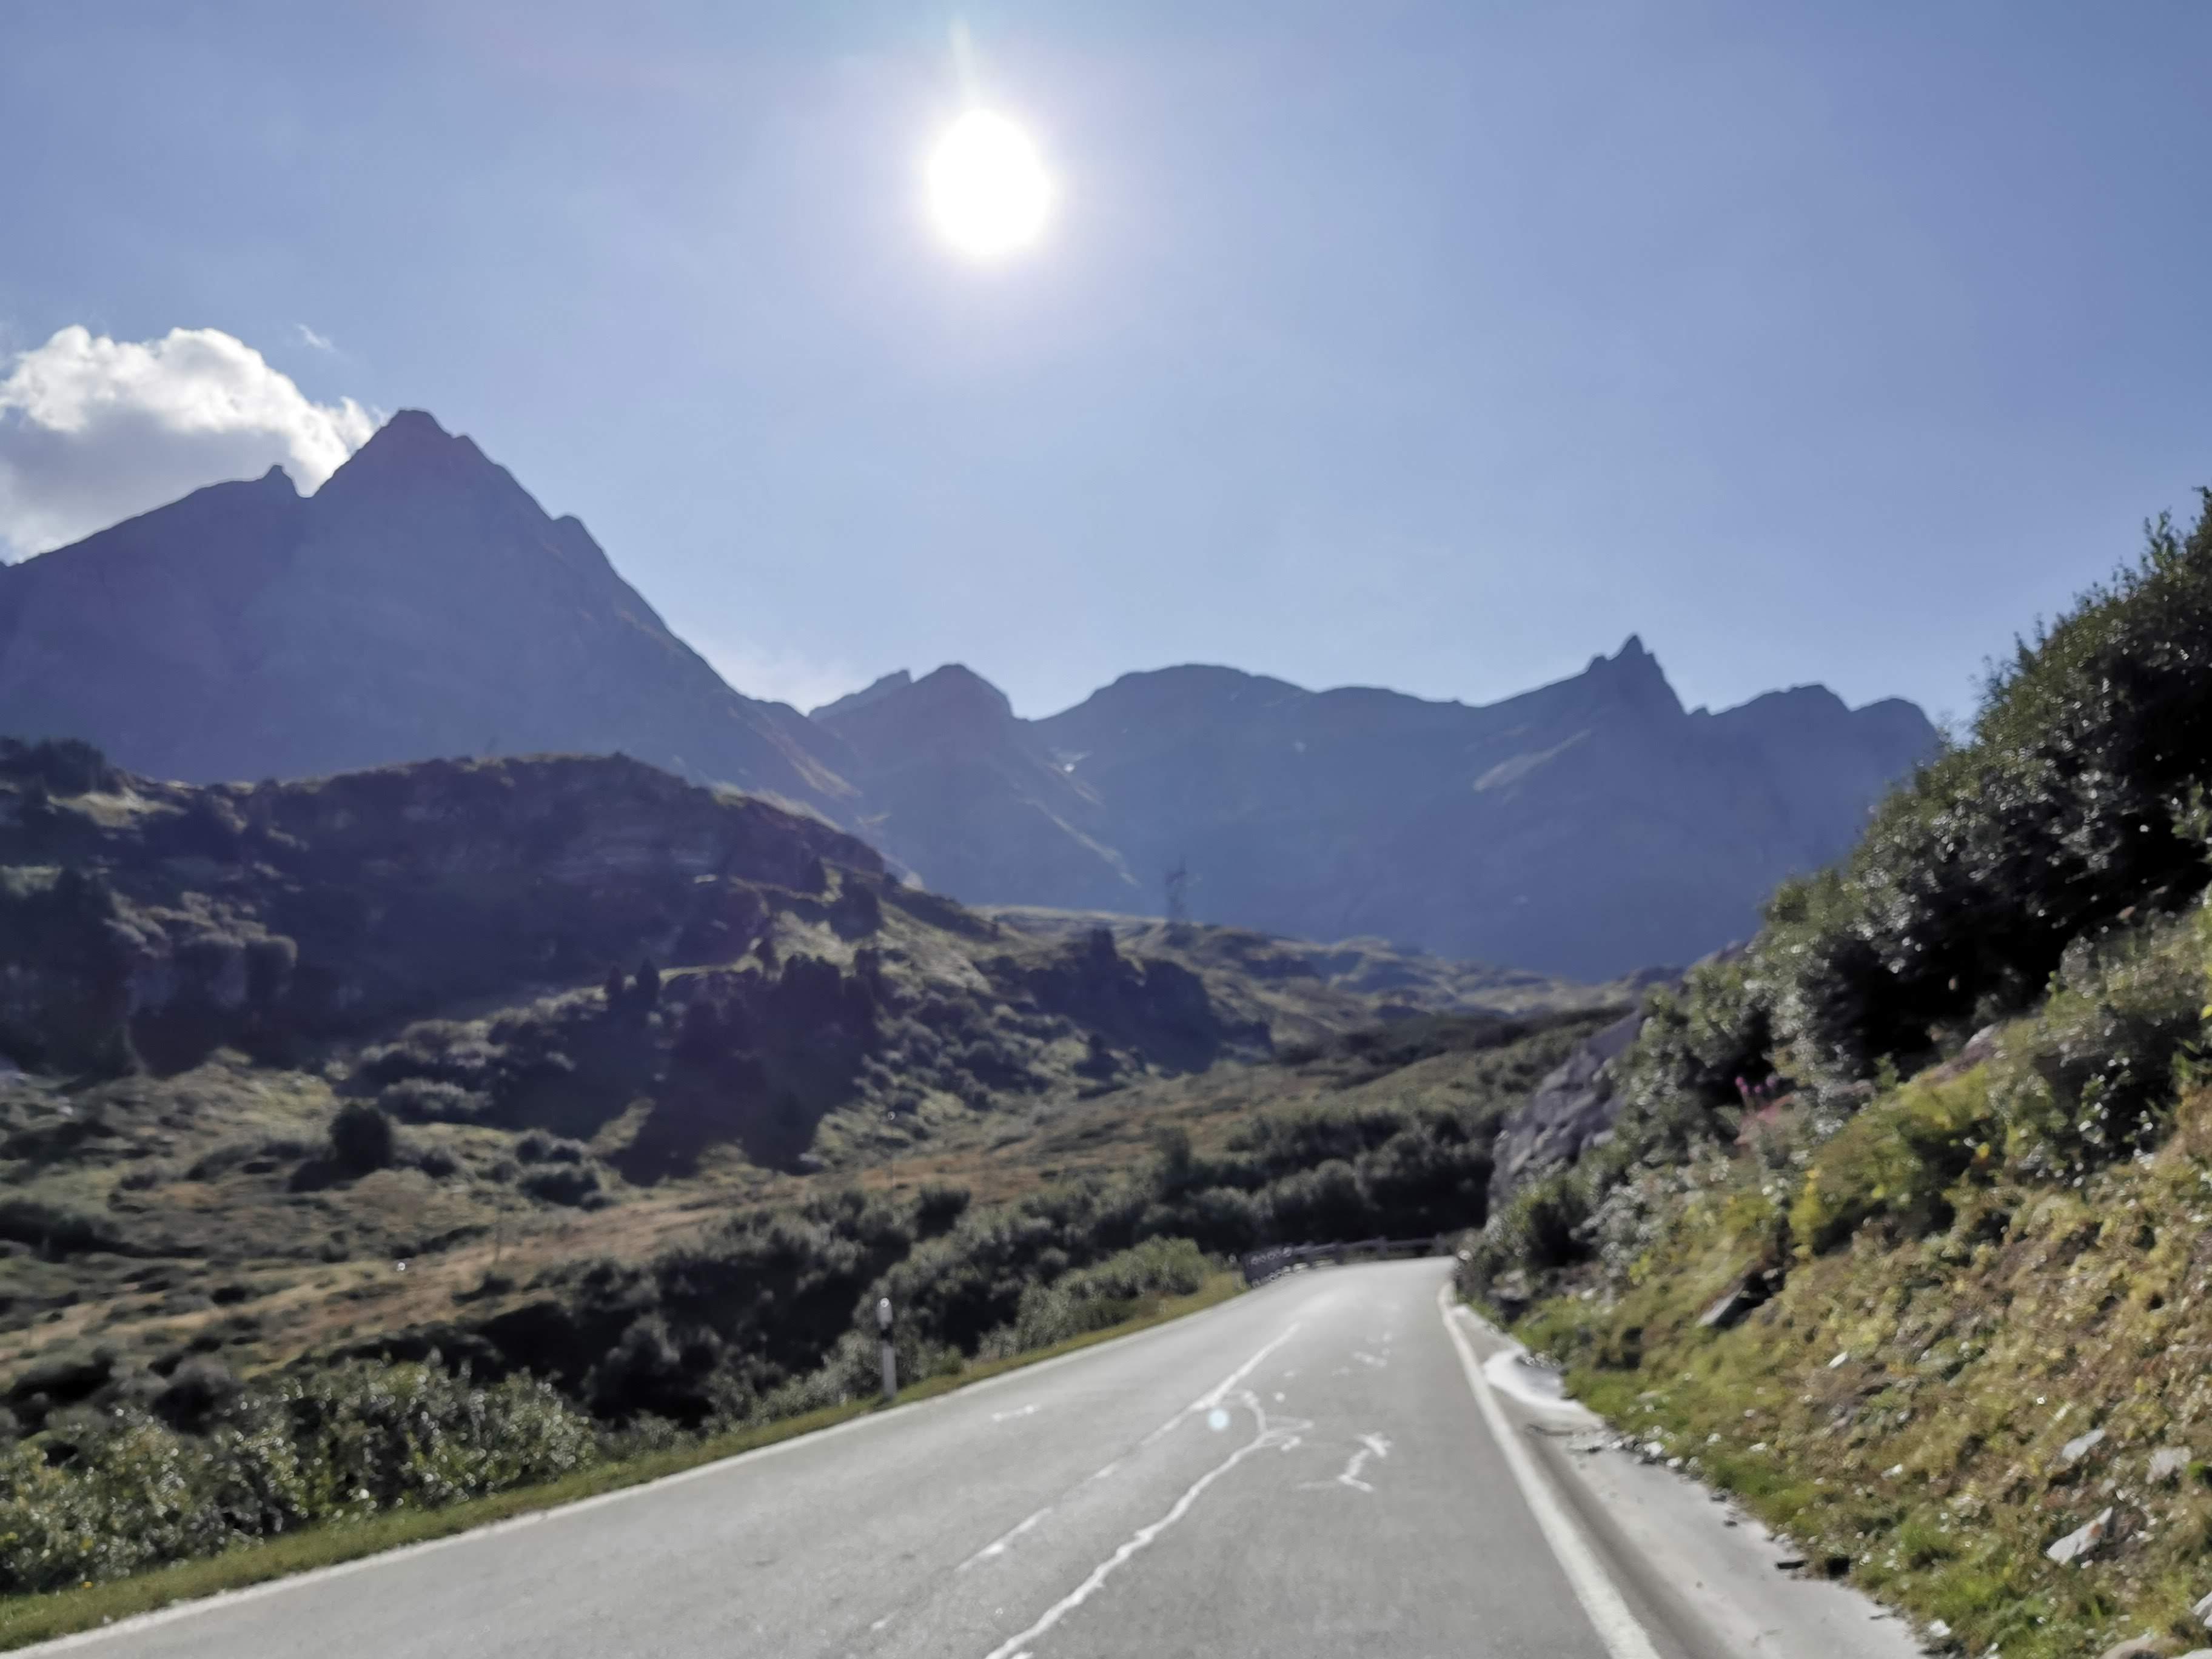 Ruhige Straße und Bergpanorama